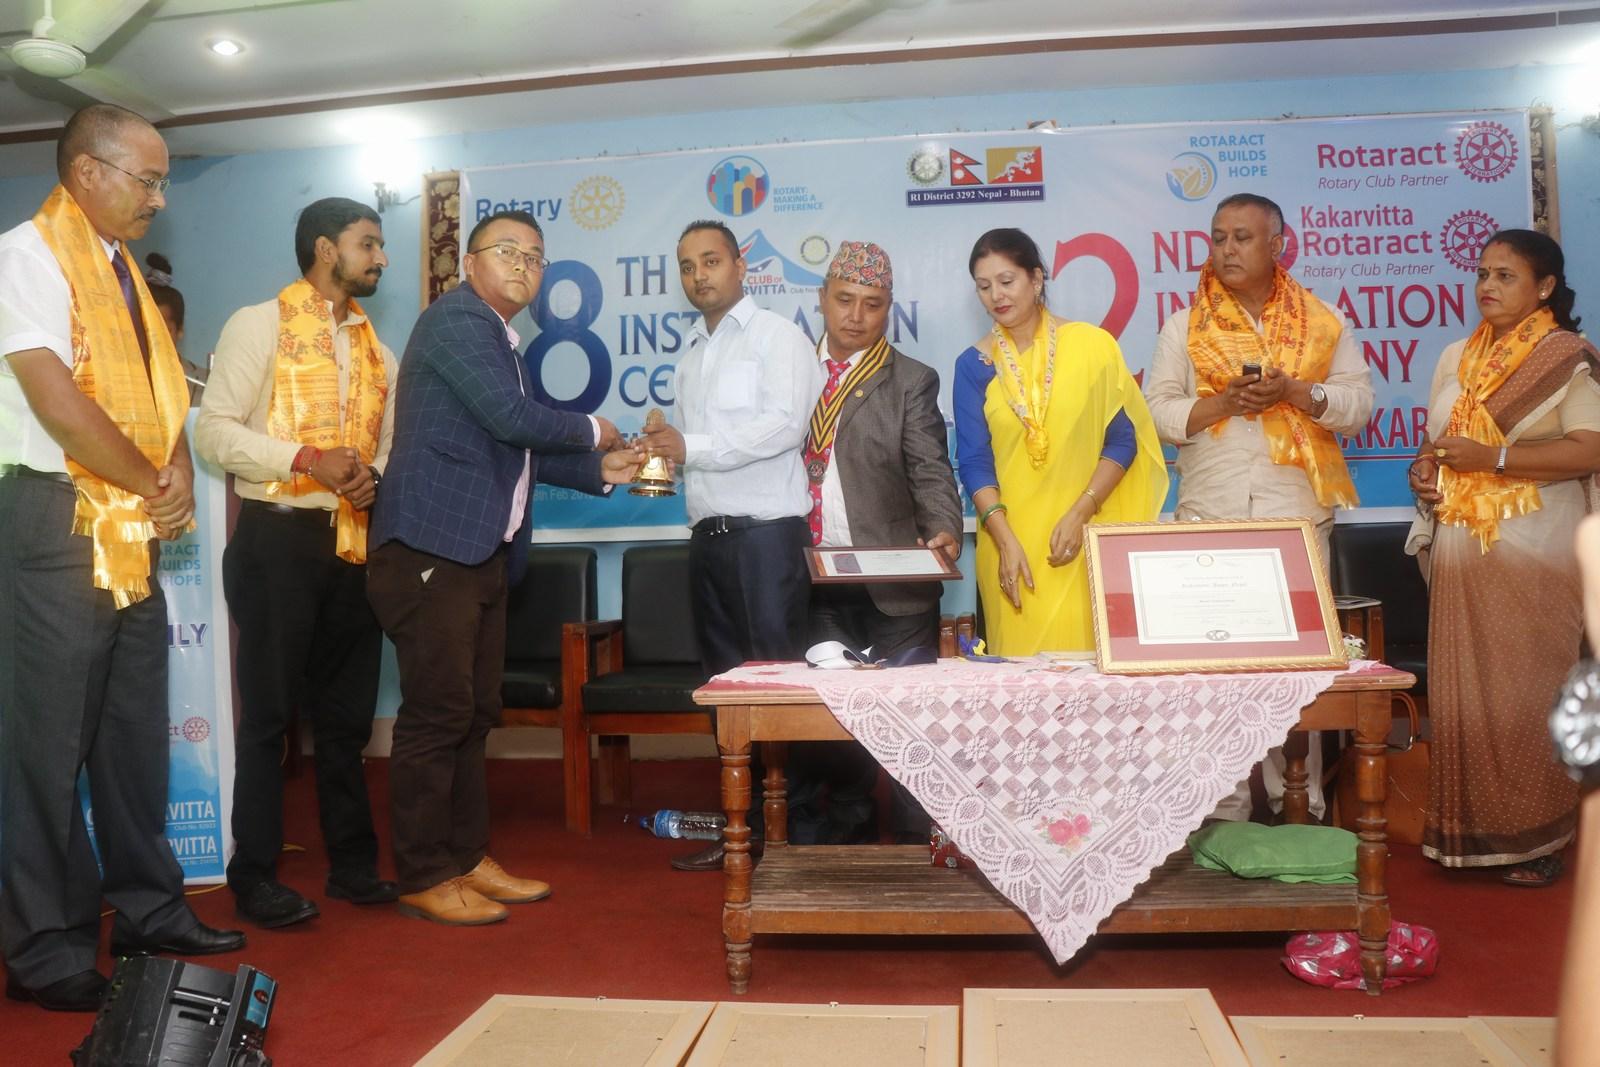 8th-Installation-Ceremony-Rotary-Club-of-Kakarvitta-59